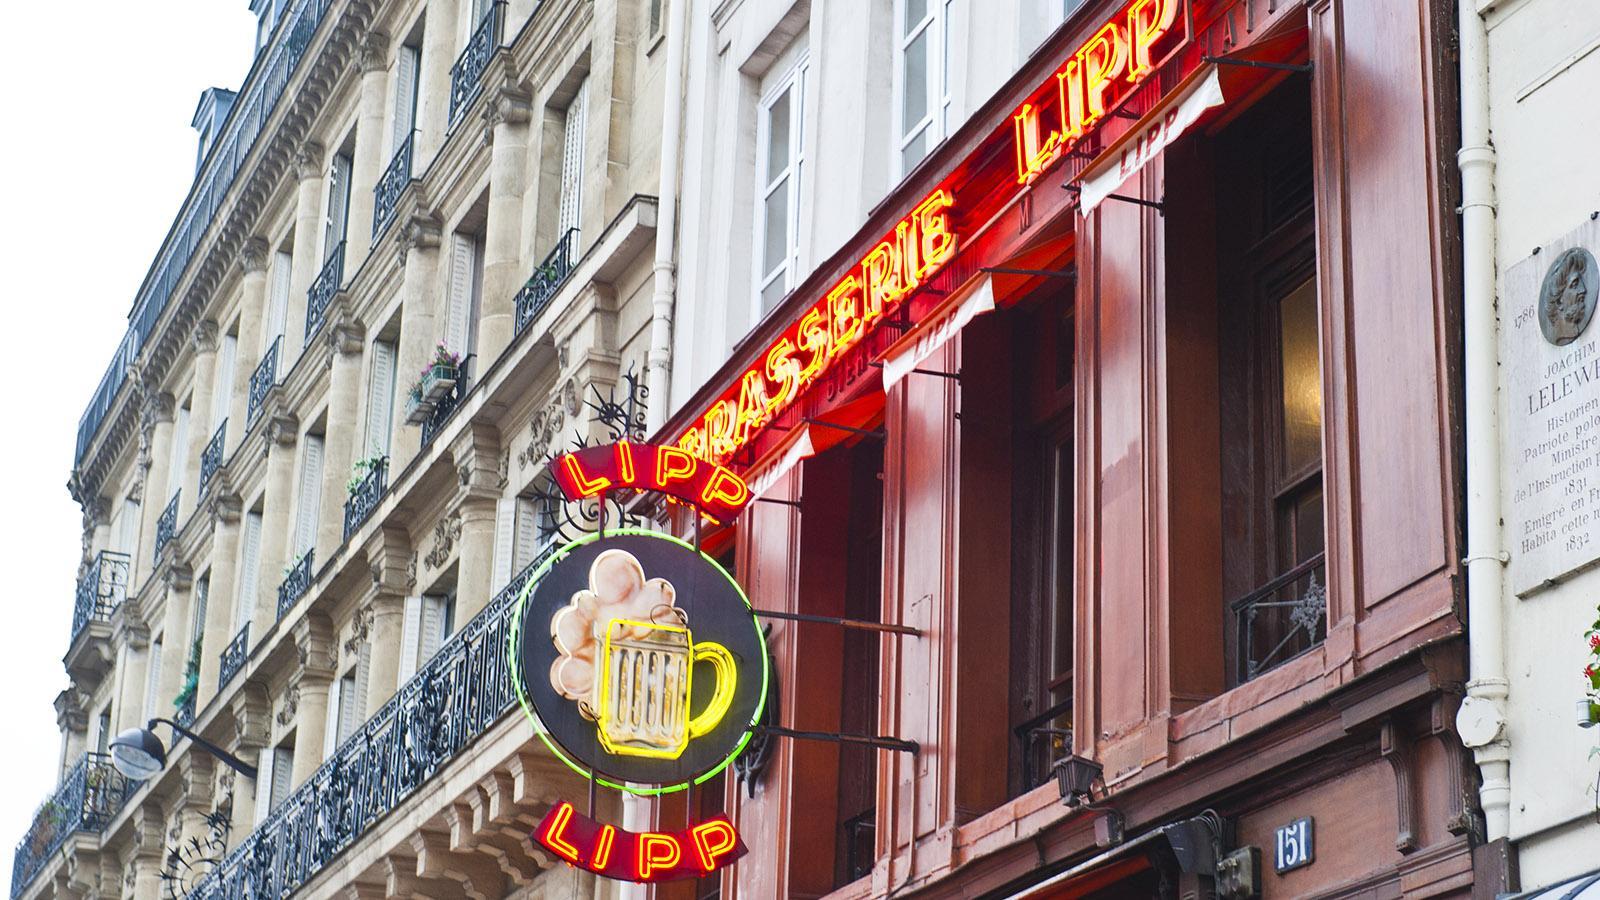 Saint-Germain-des-Prés. Legendär: die Brasserie Lipp. Foto: Hilke Maunder